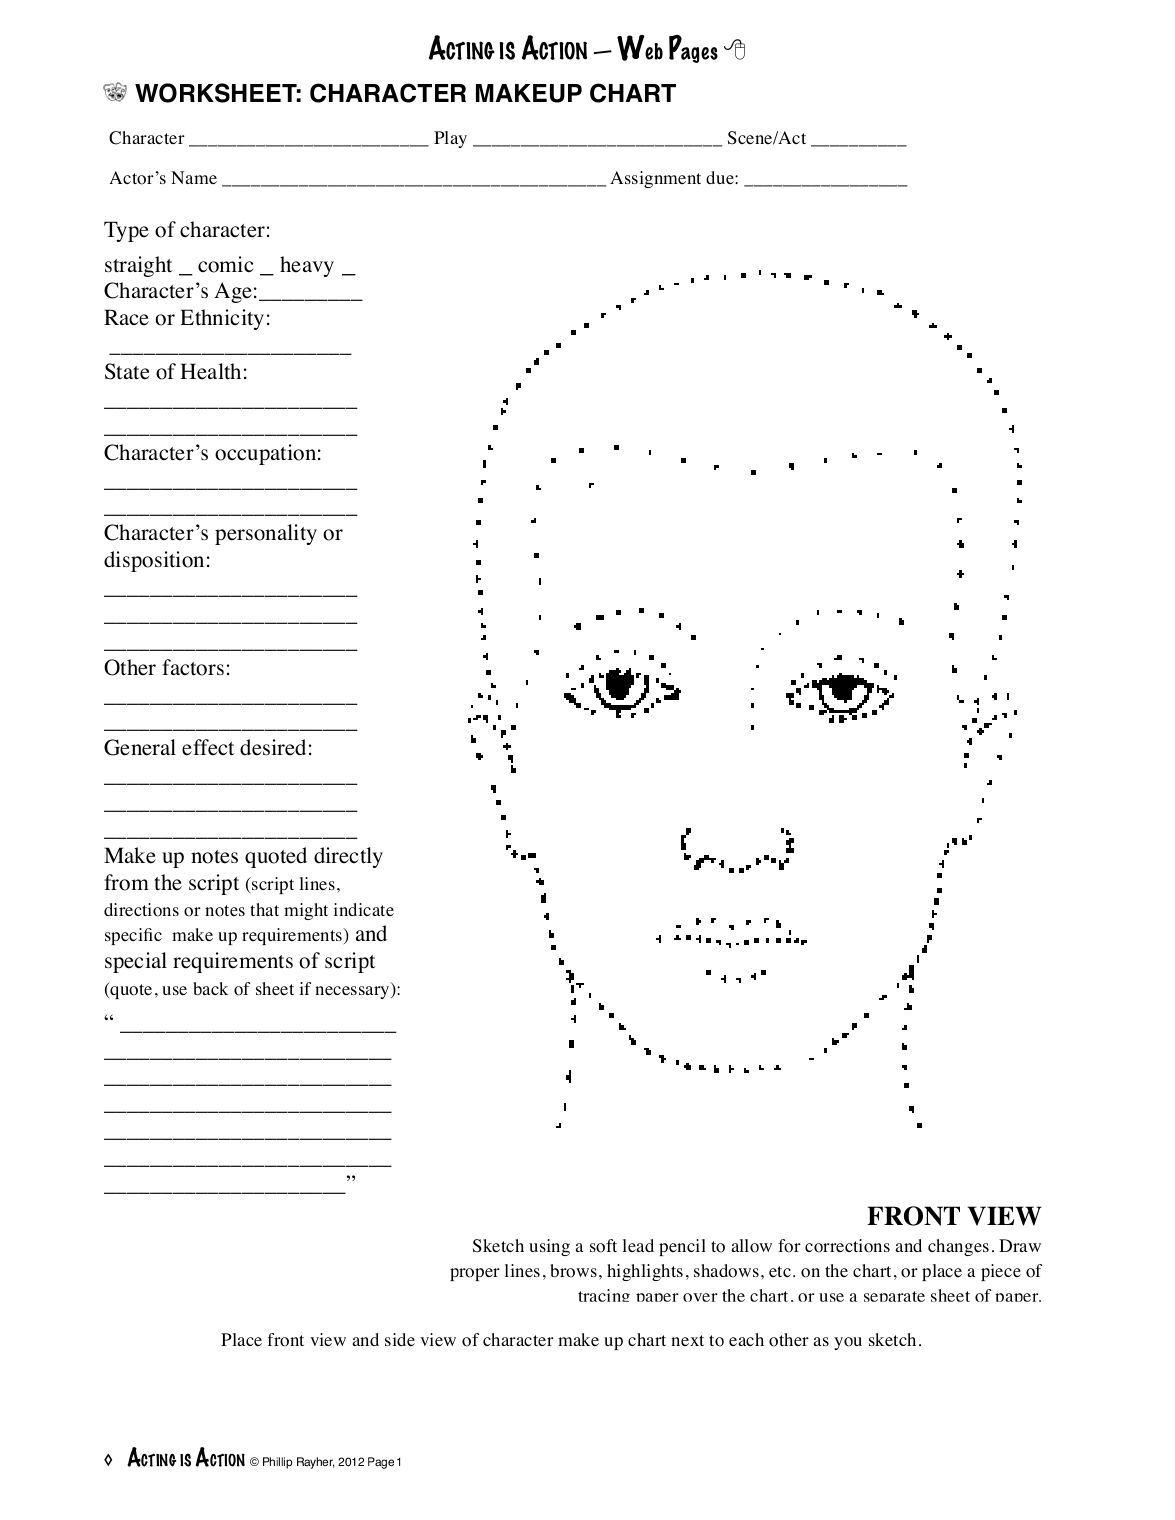 worksheet Script Analysis Worksheet worksheet character makeup chart the sota theatre department department